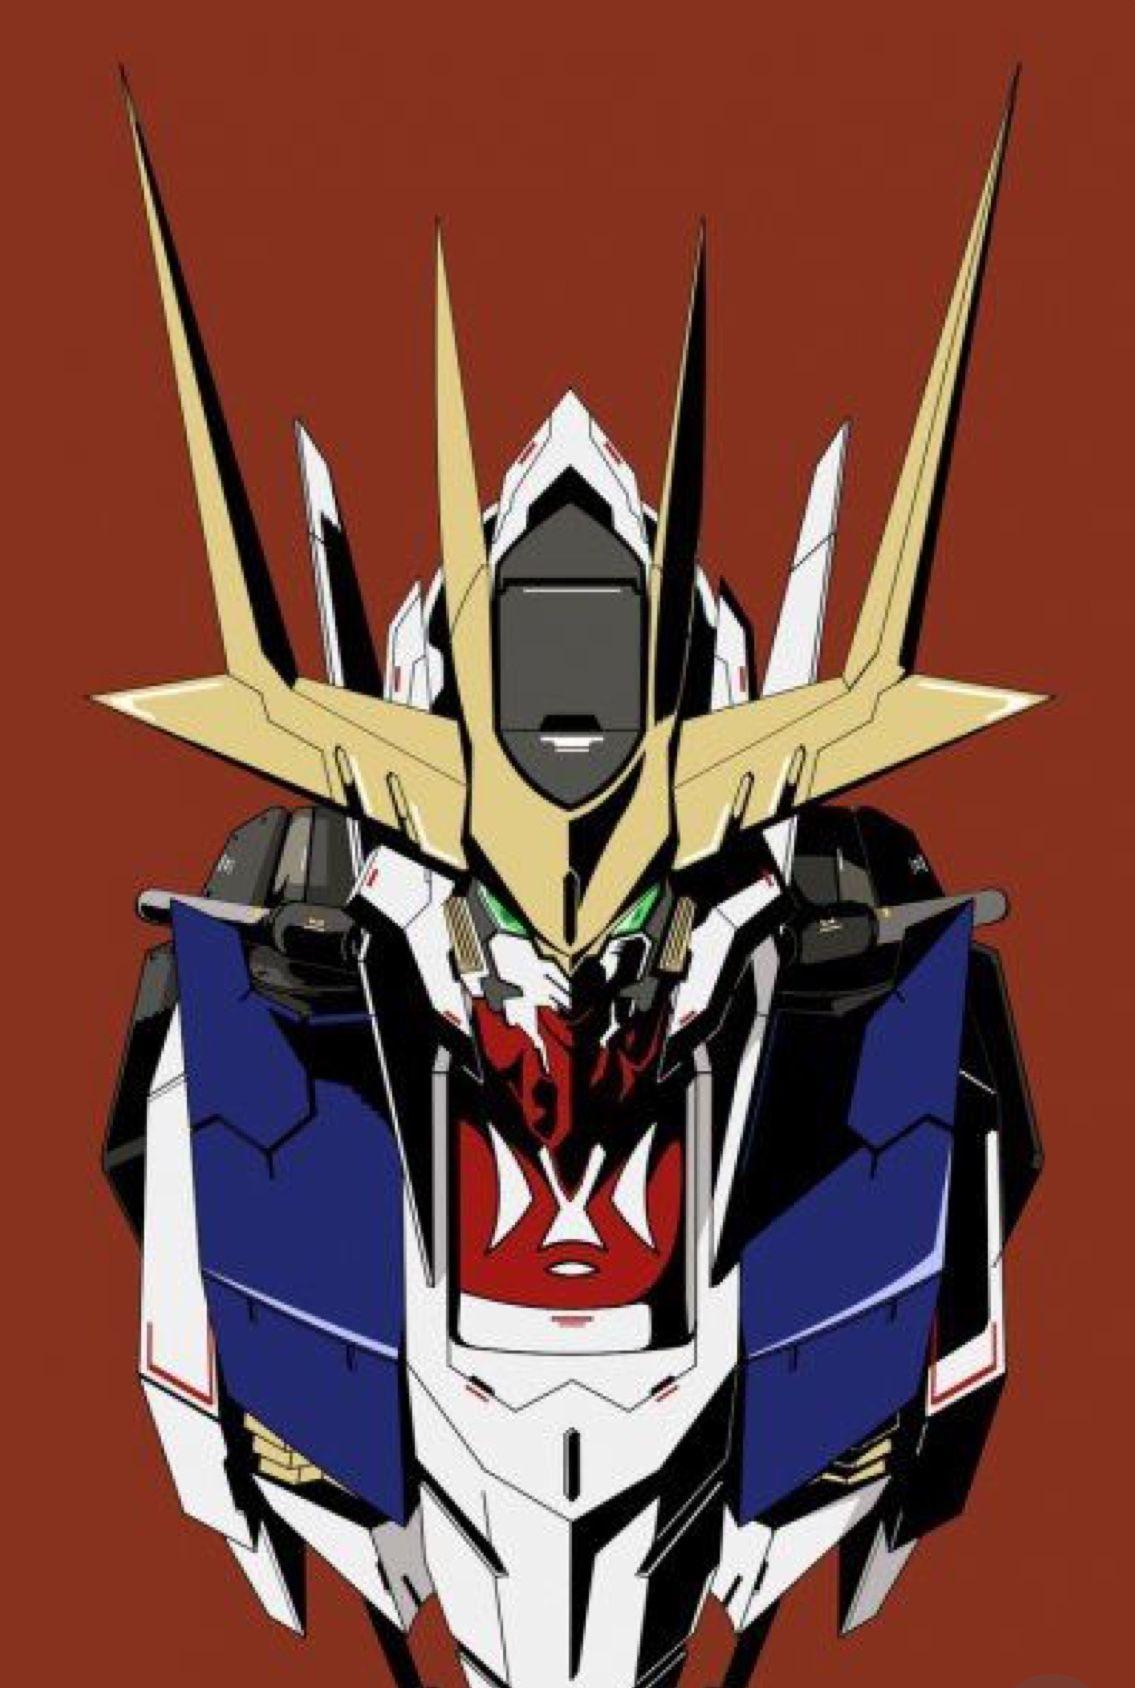 Pin By Julio Cesar Ceron Trejo On ロボット Gundam Iron Blooded Orphans Gundam Wallpapers Gundam Art